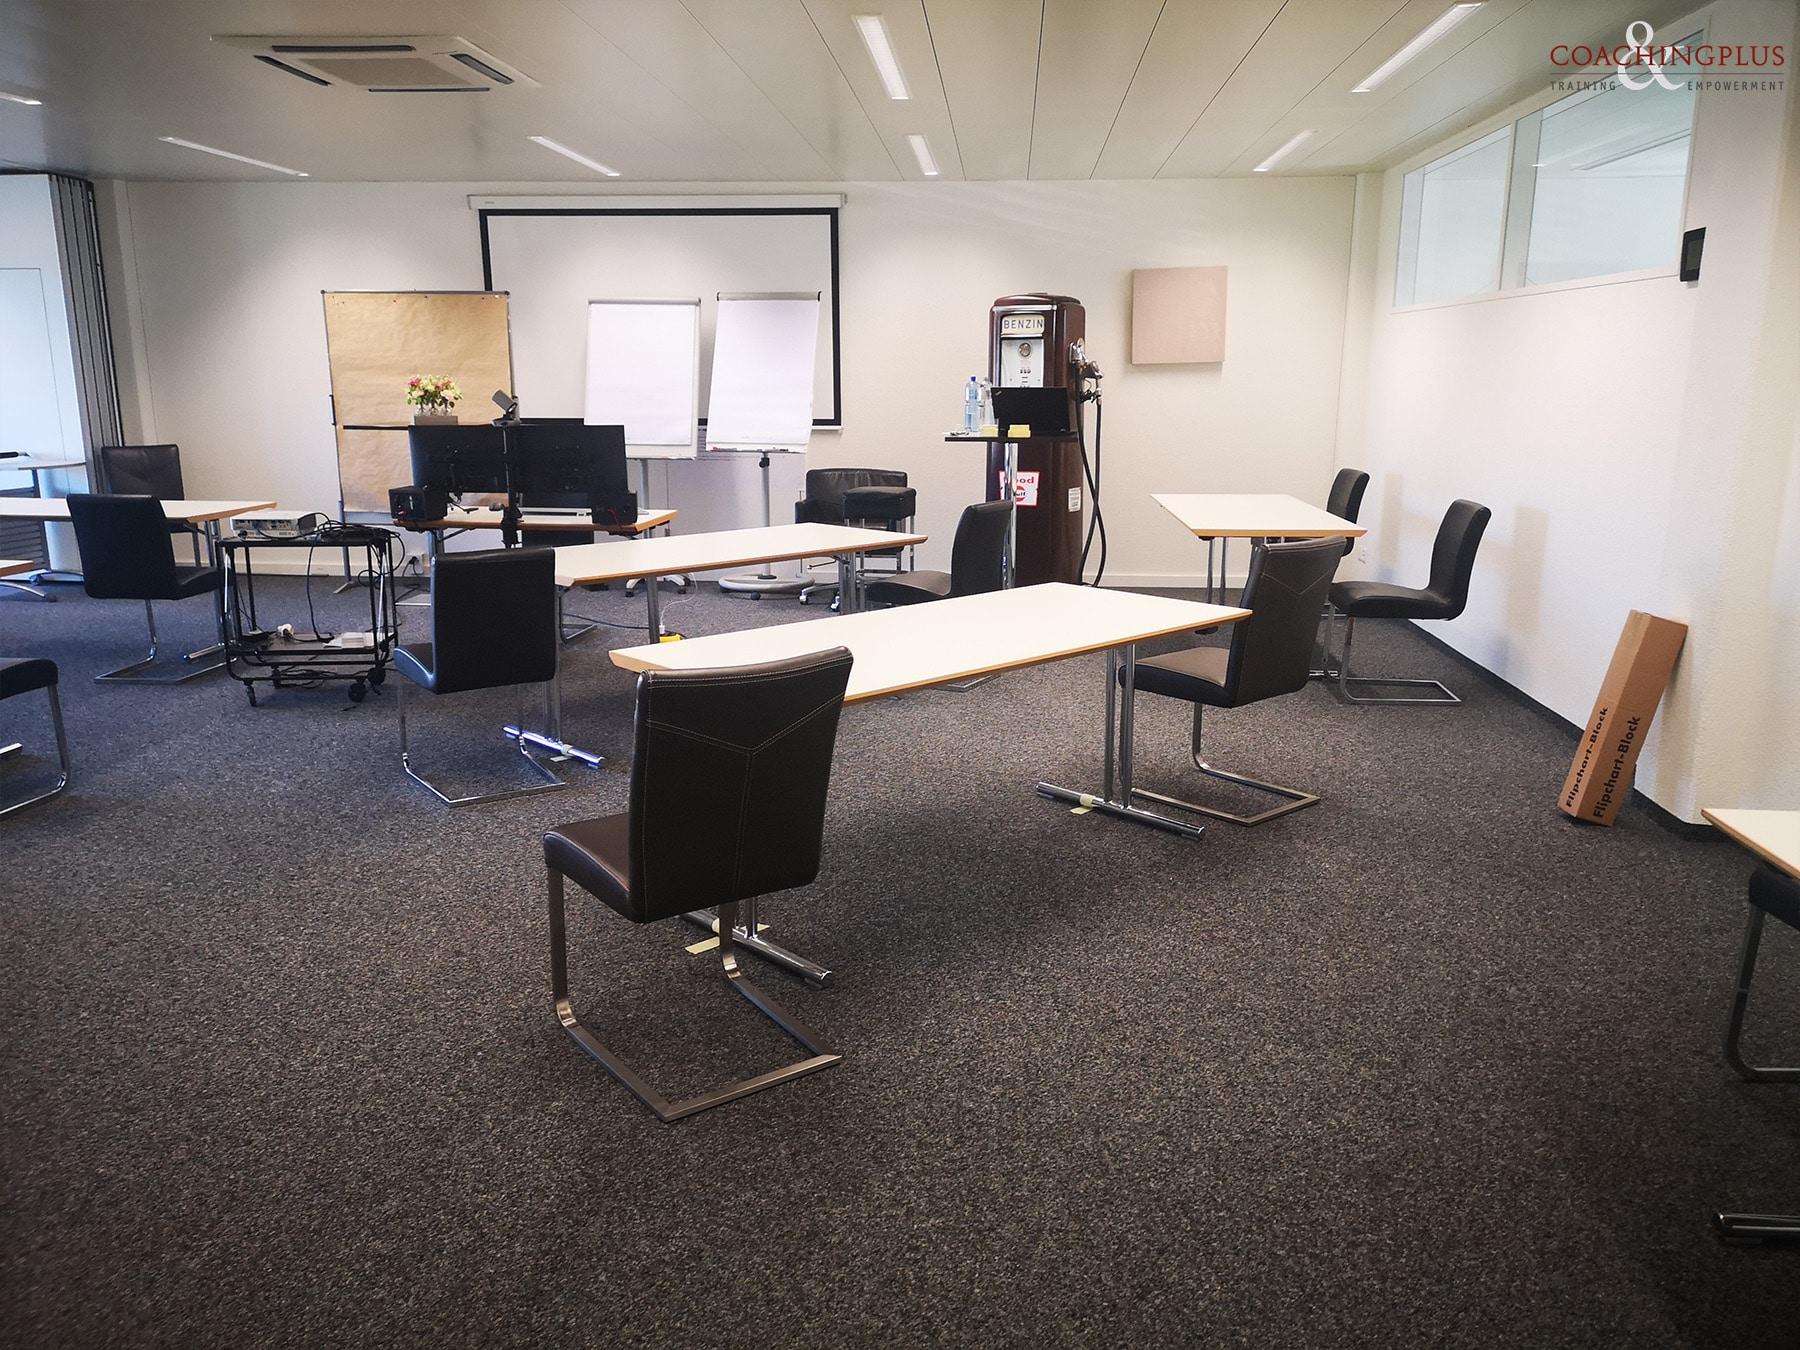 Schutzkonzept Klassenzimmer bei Coachingplus